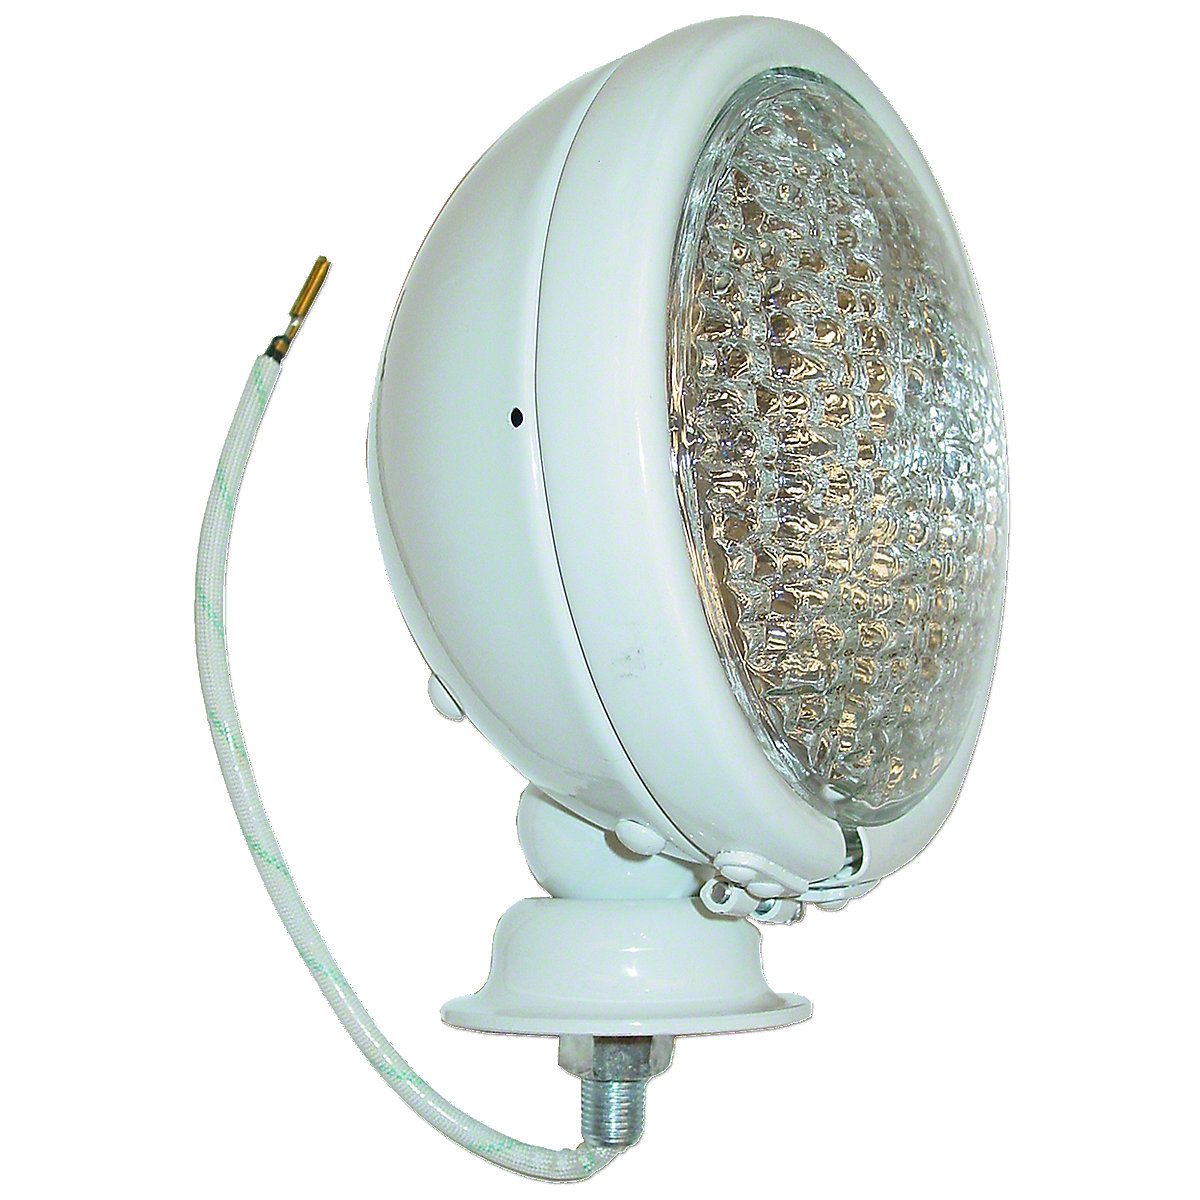 6 Volt Tractor Headlight Bulb : Fds volt headlight assembly